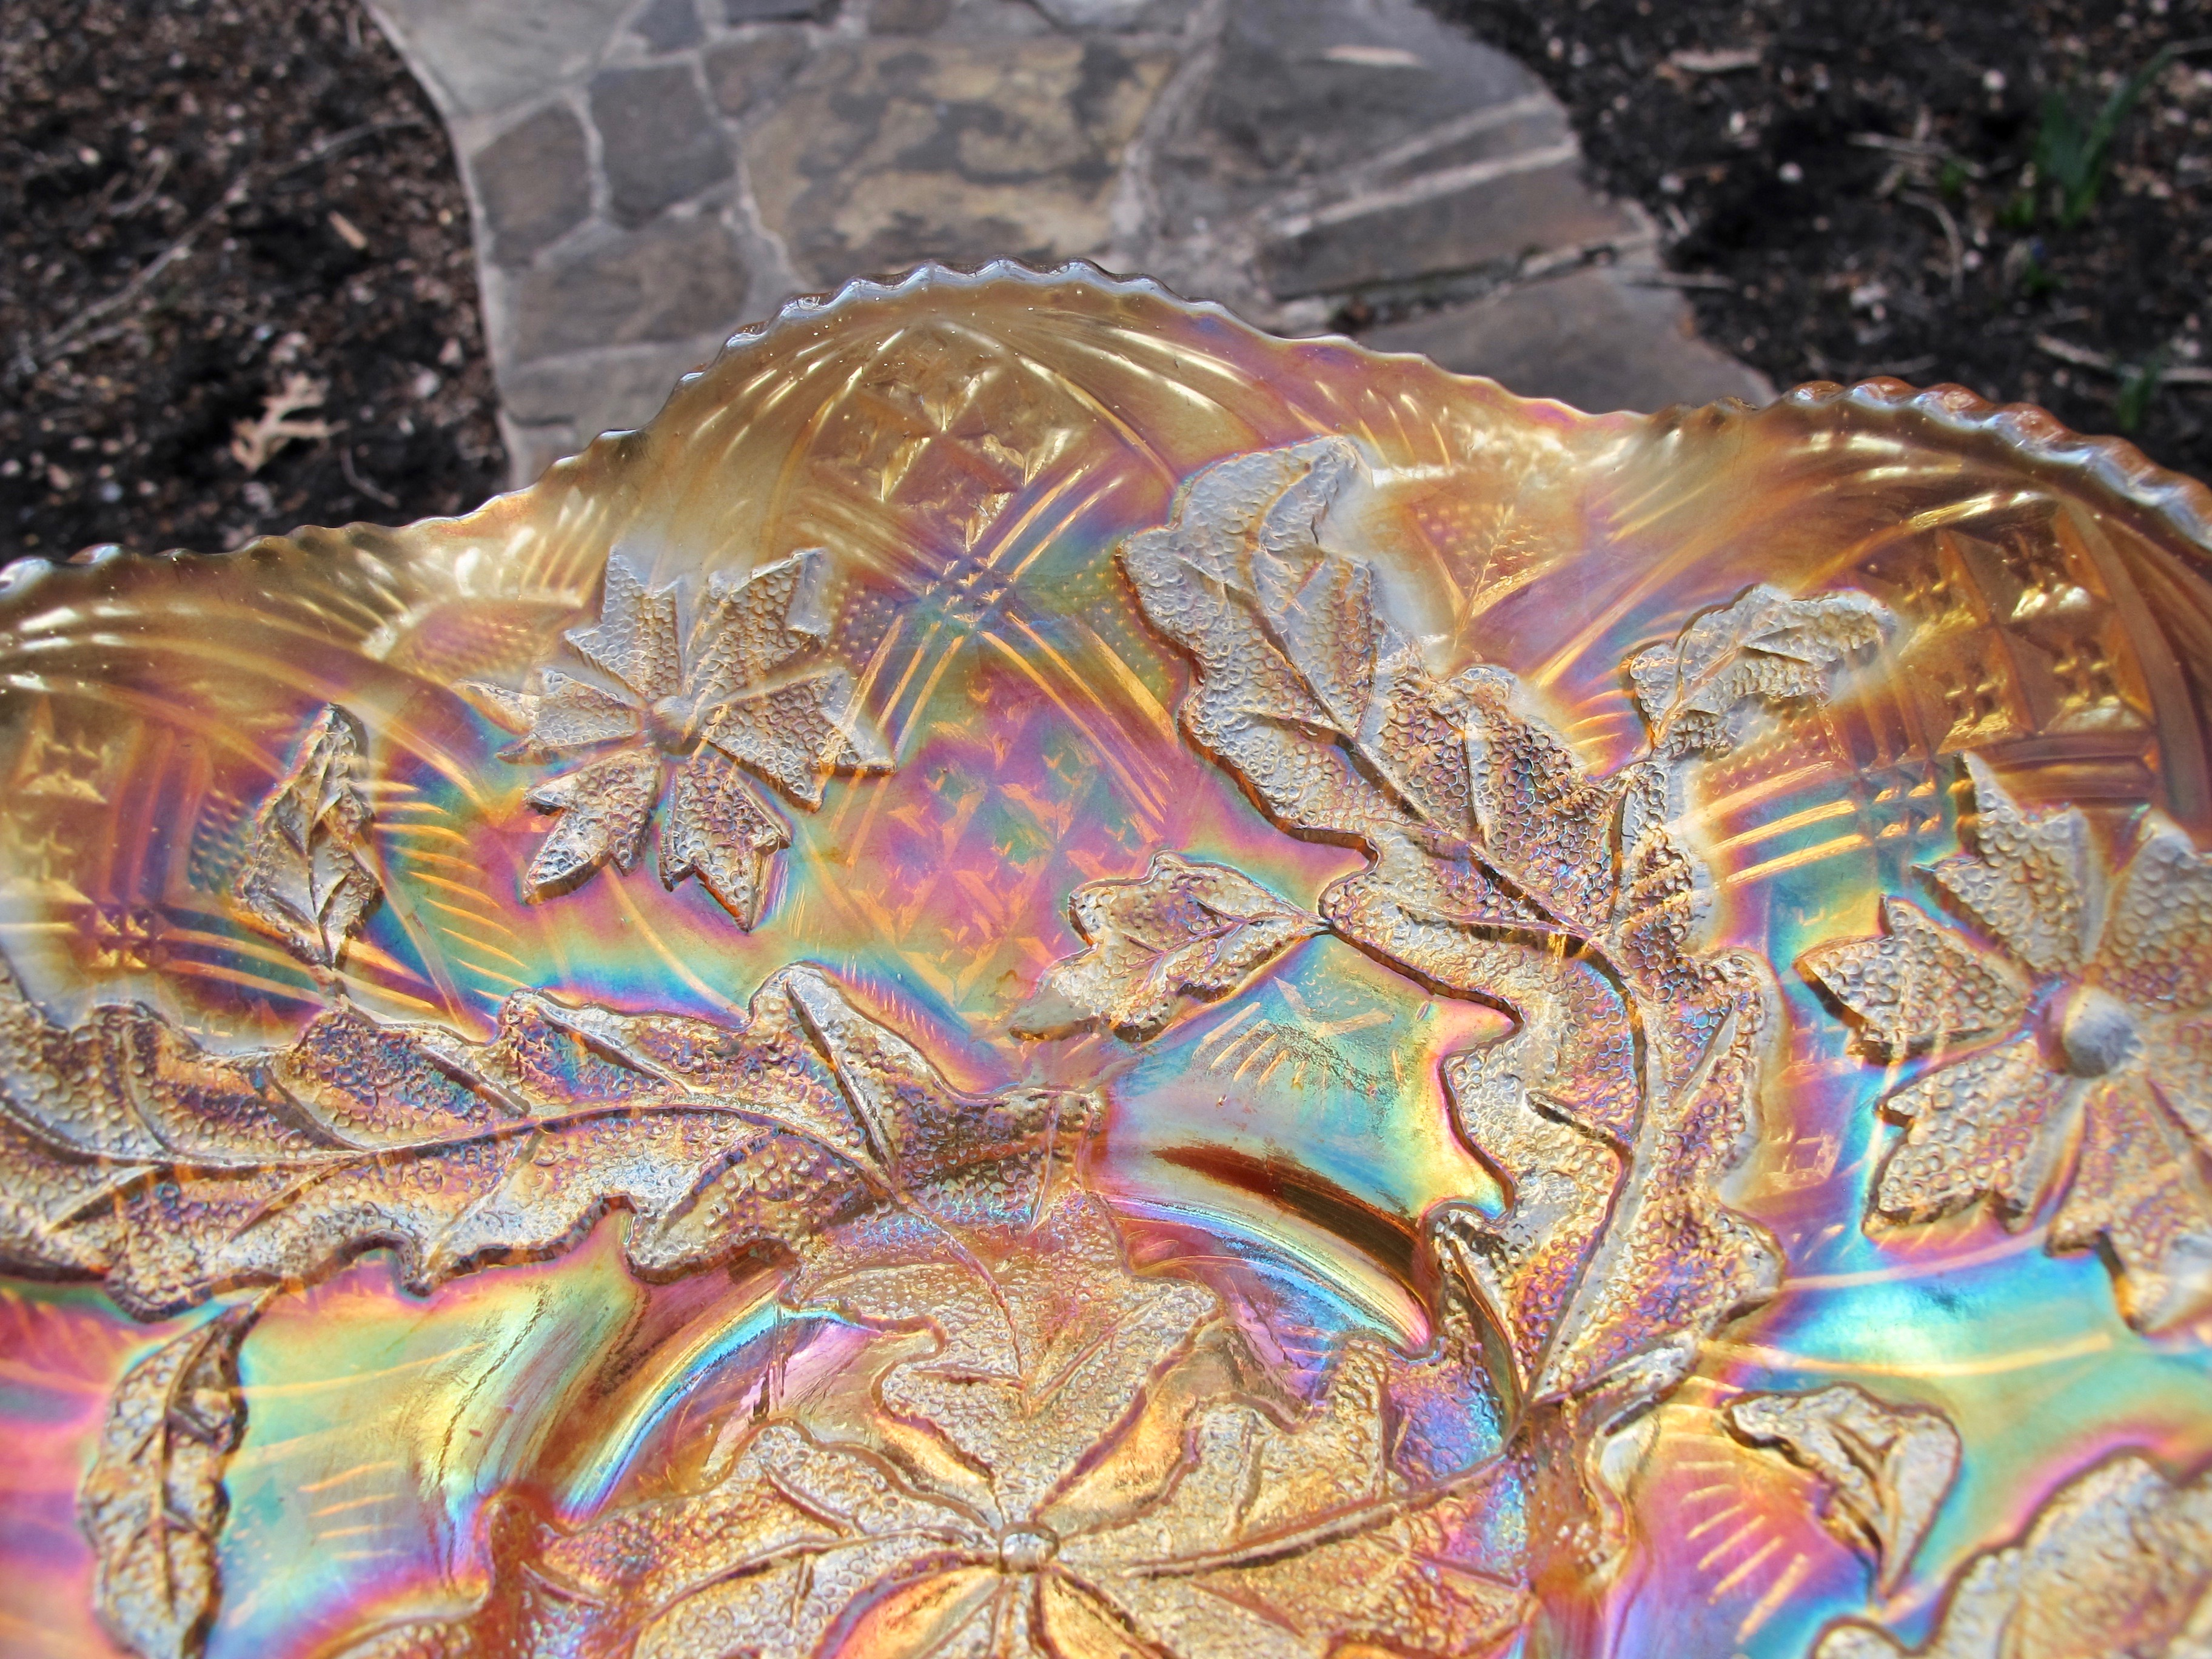 Antique Millersburg Whirling Leaves Marigold Carnival Glass Bowl Carnival Glass